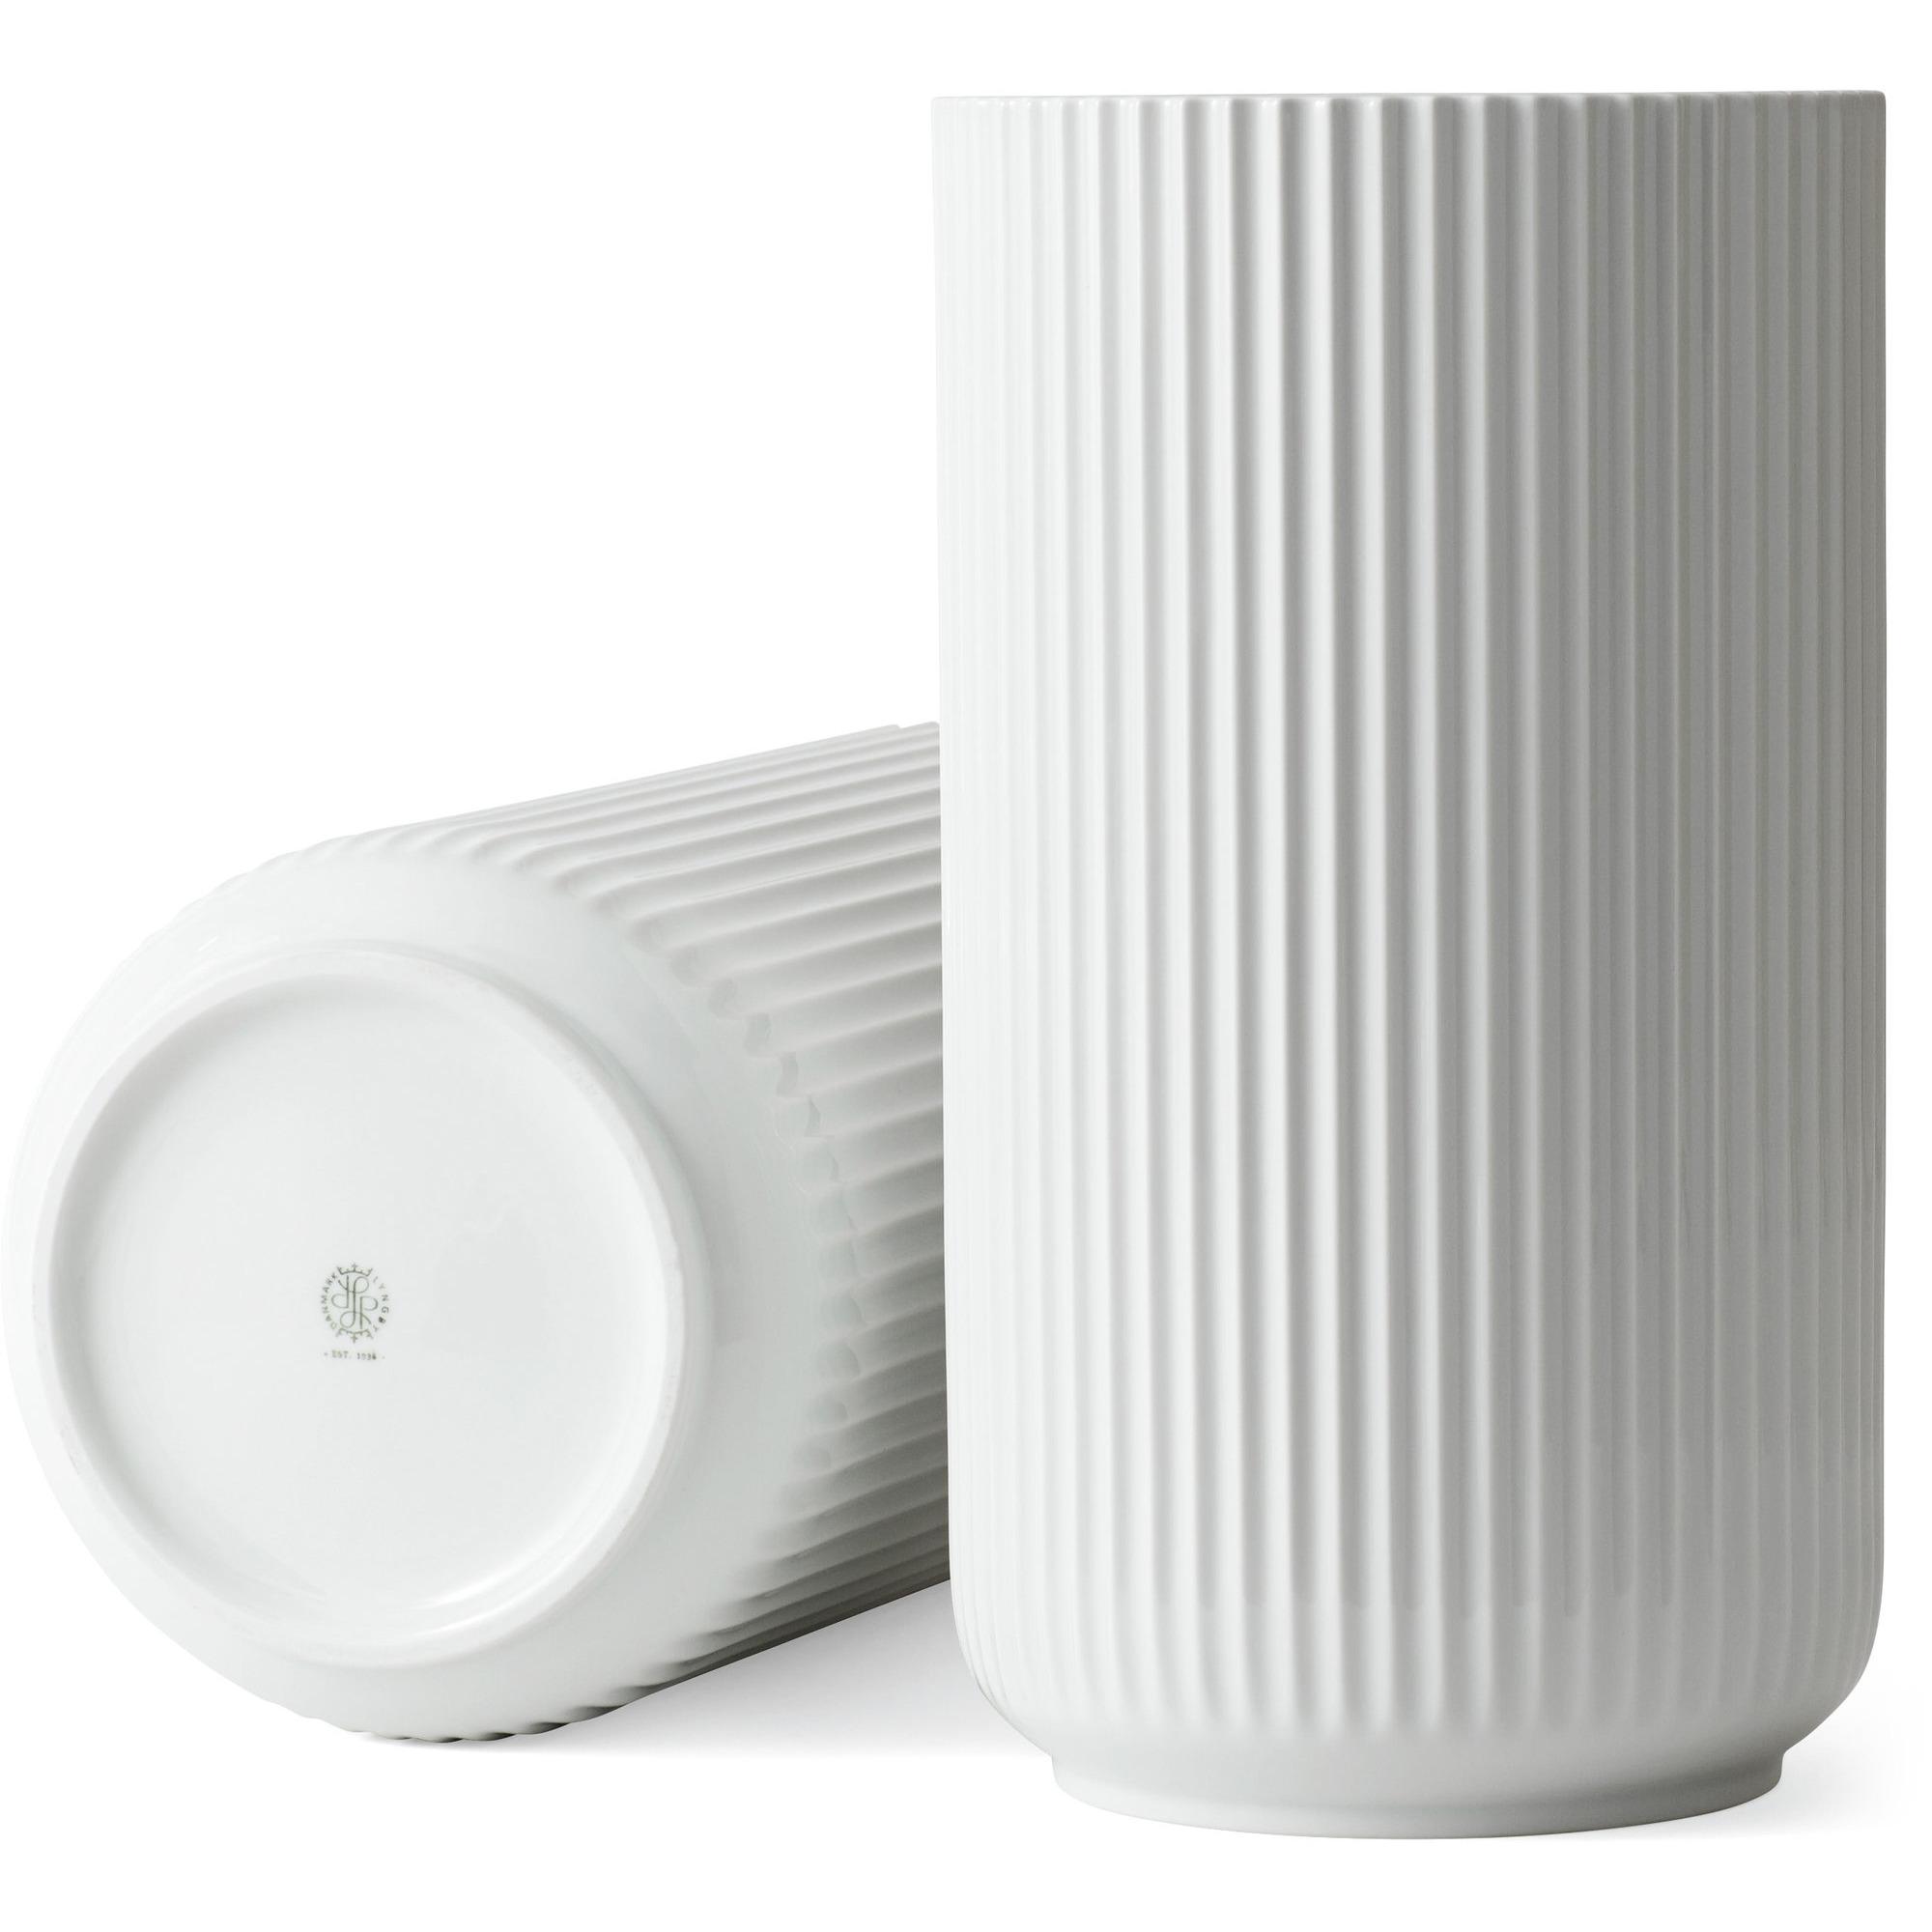 Lyngby Porcelæn Lyngbyvasen 38 cm. porslin – vit